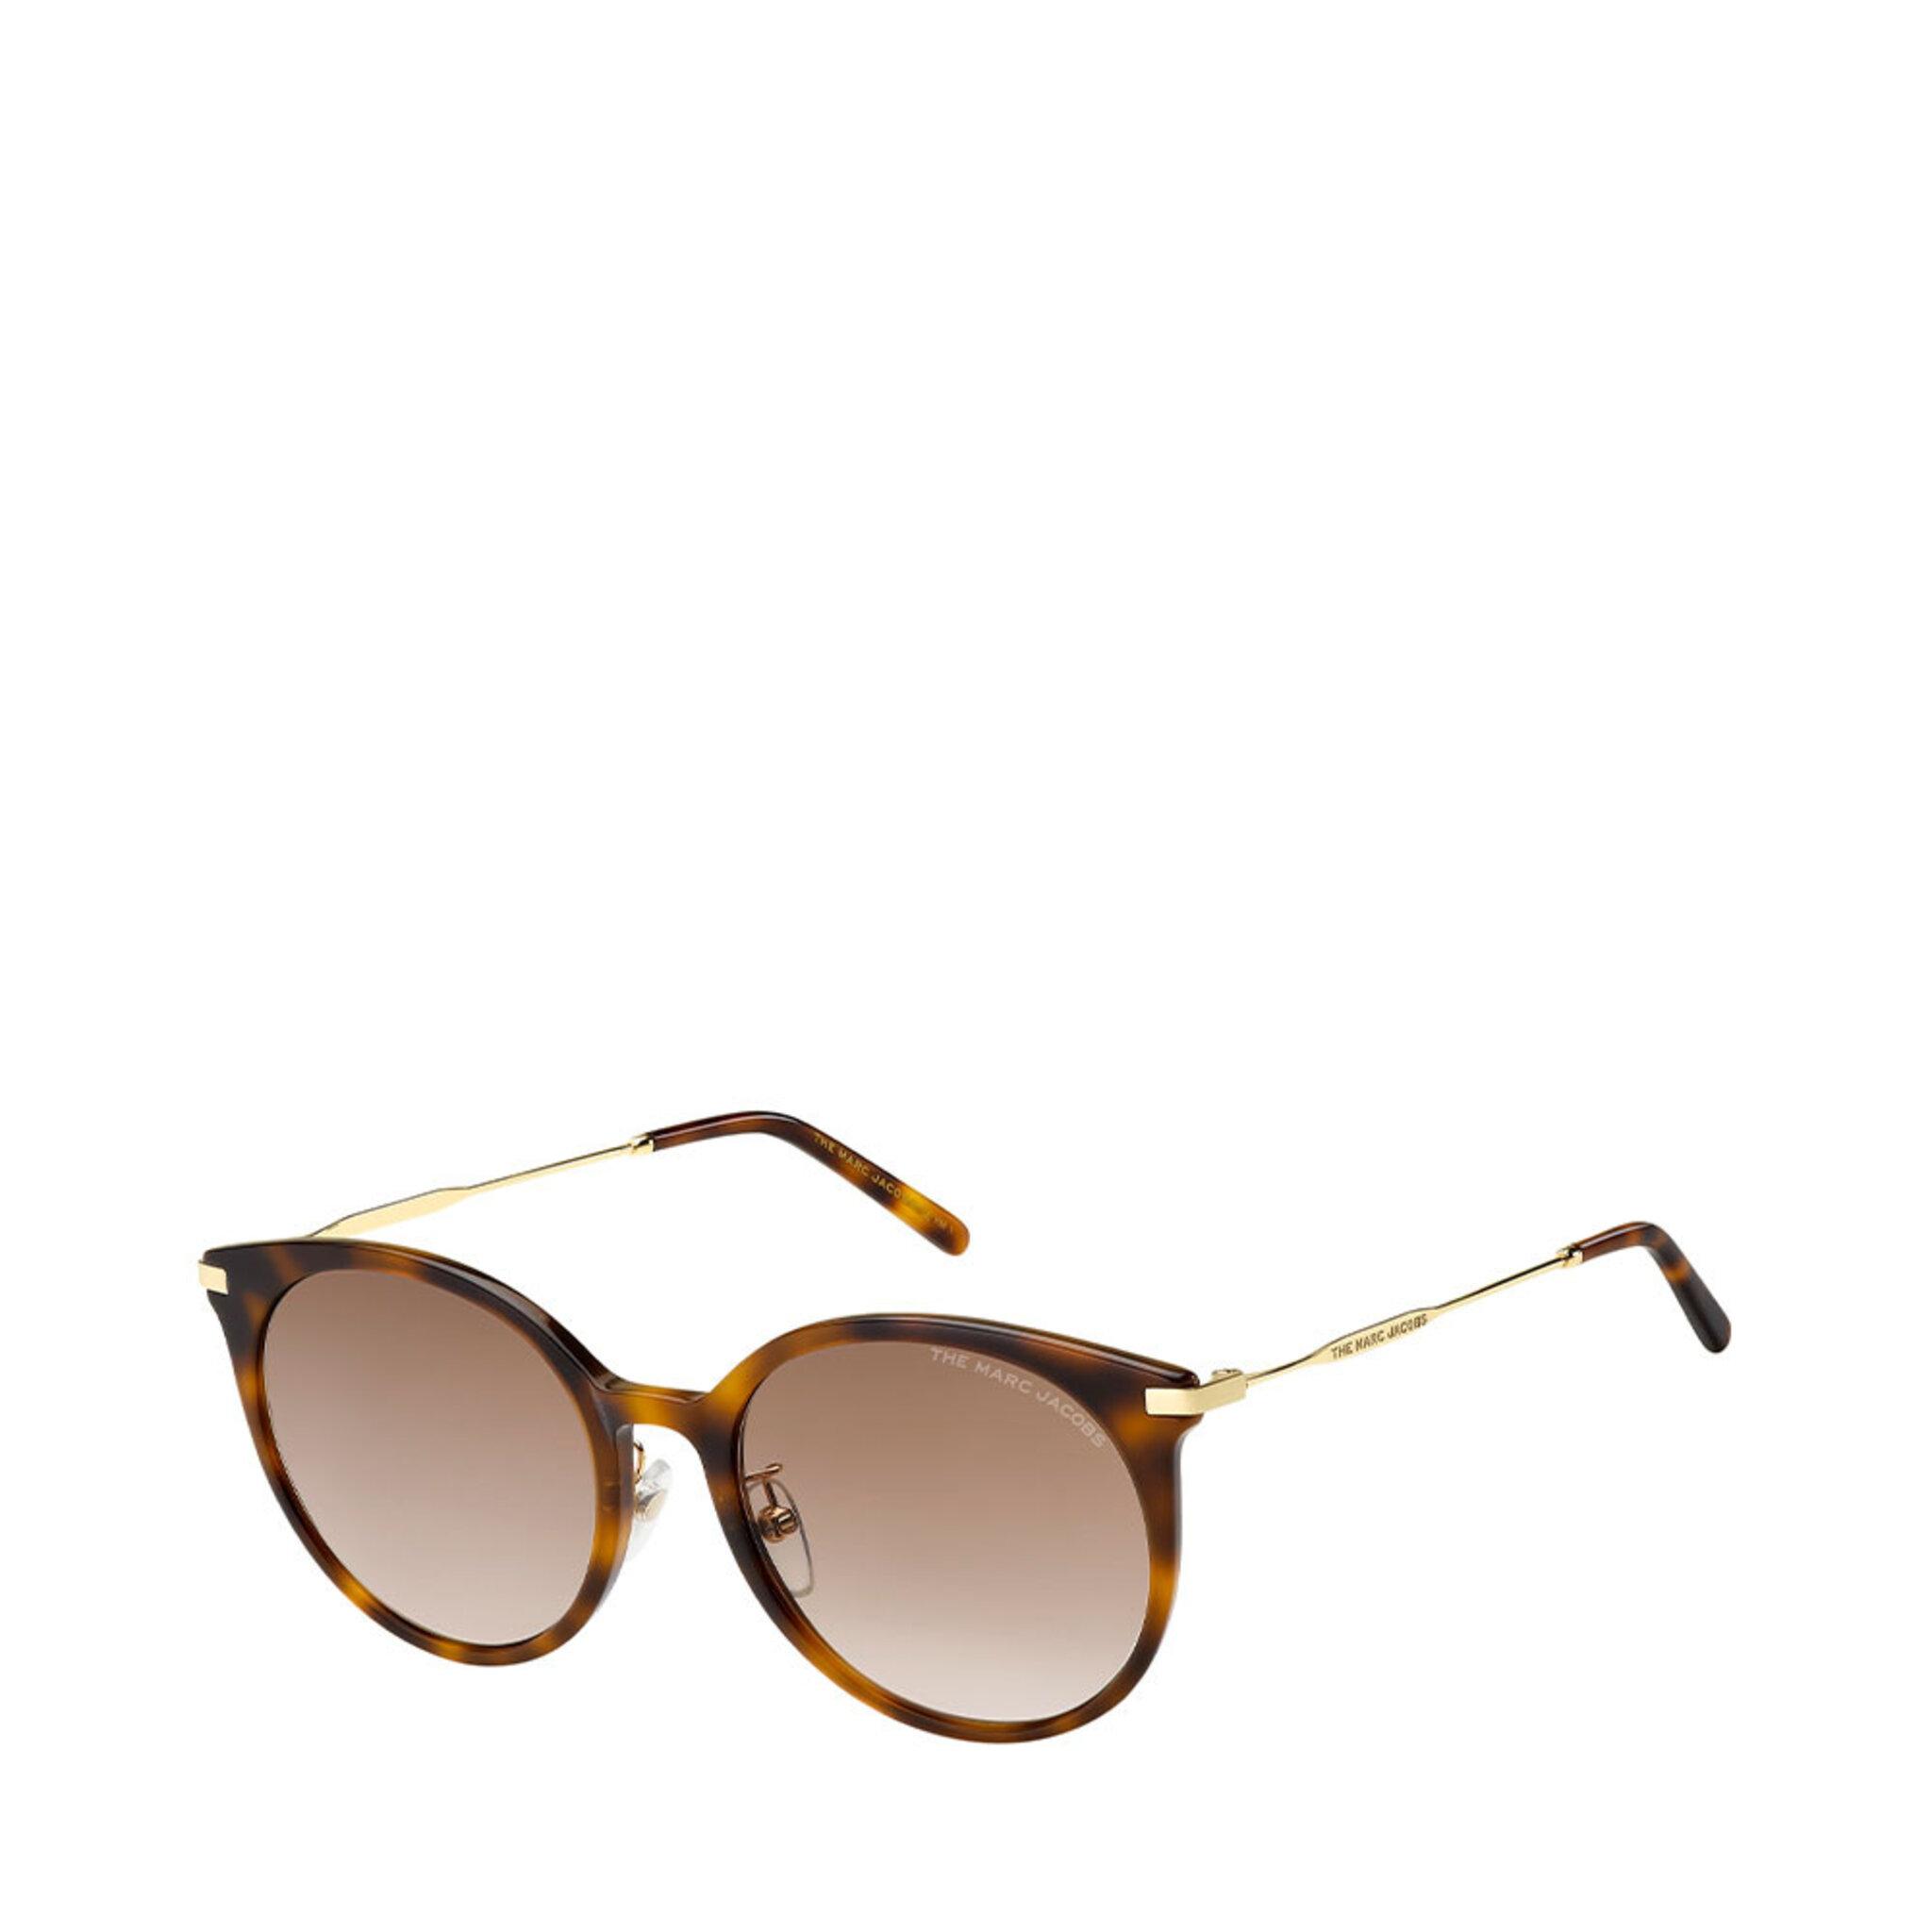 Sunglasses MARC 552/G/S